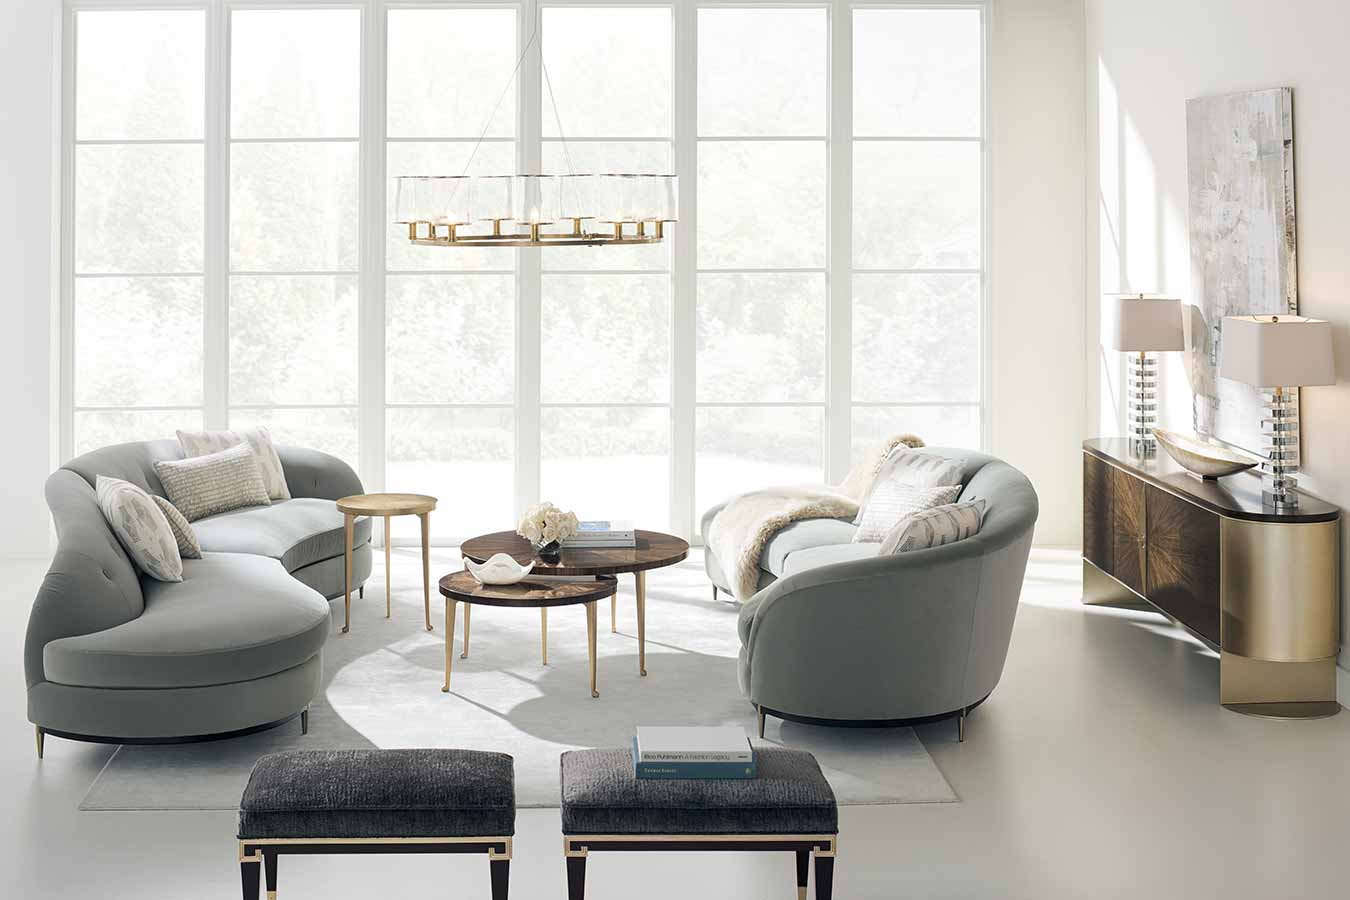 Living Room | Contemporary Luxury Designer Modern Exclusive Handcrafted Furniture | Sandton Johannesburg